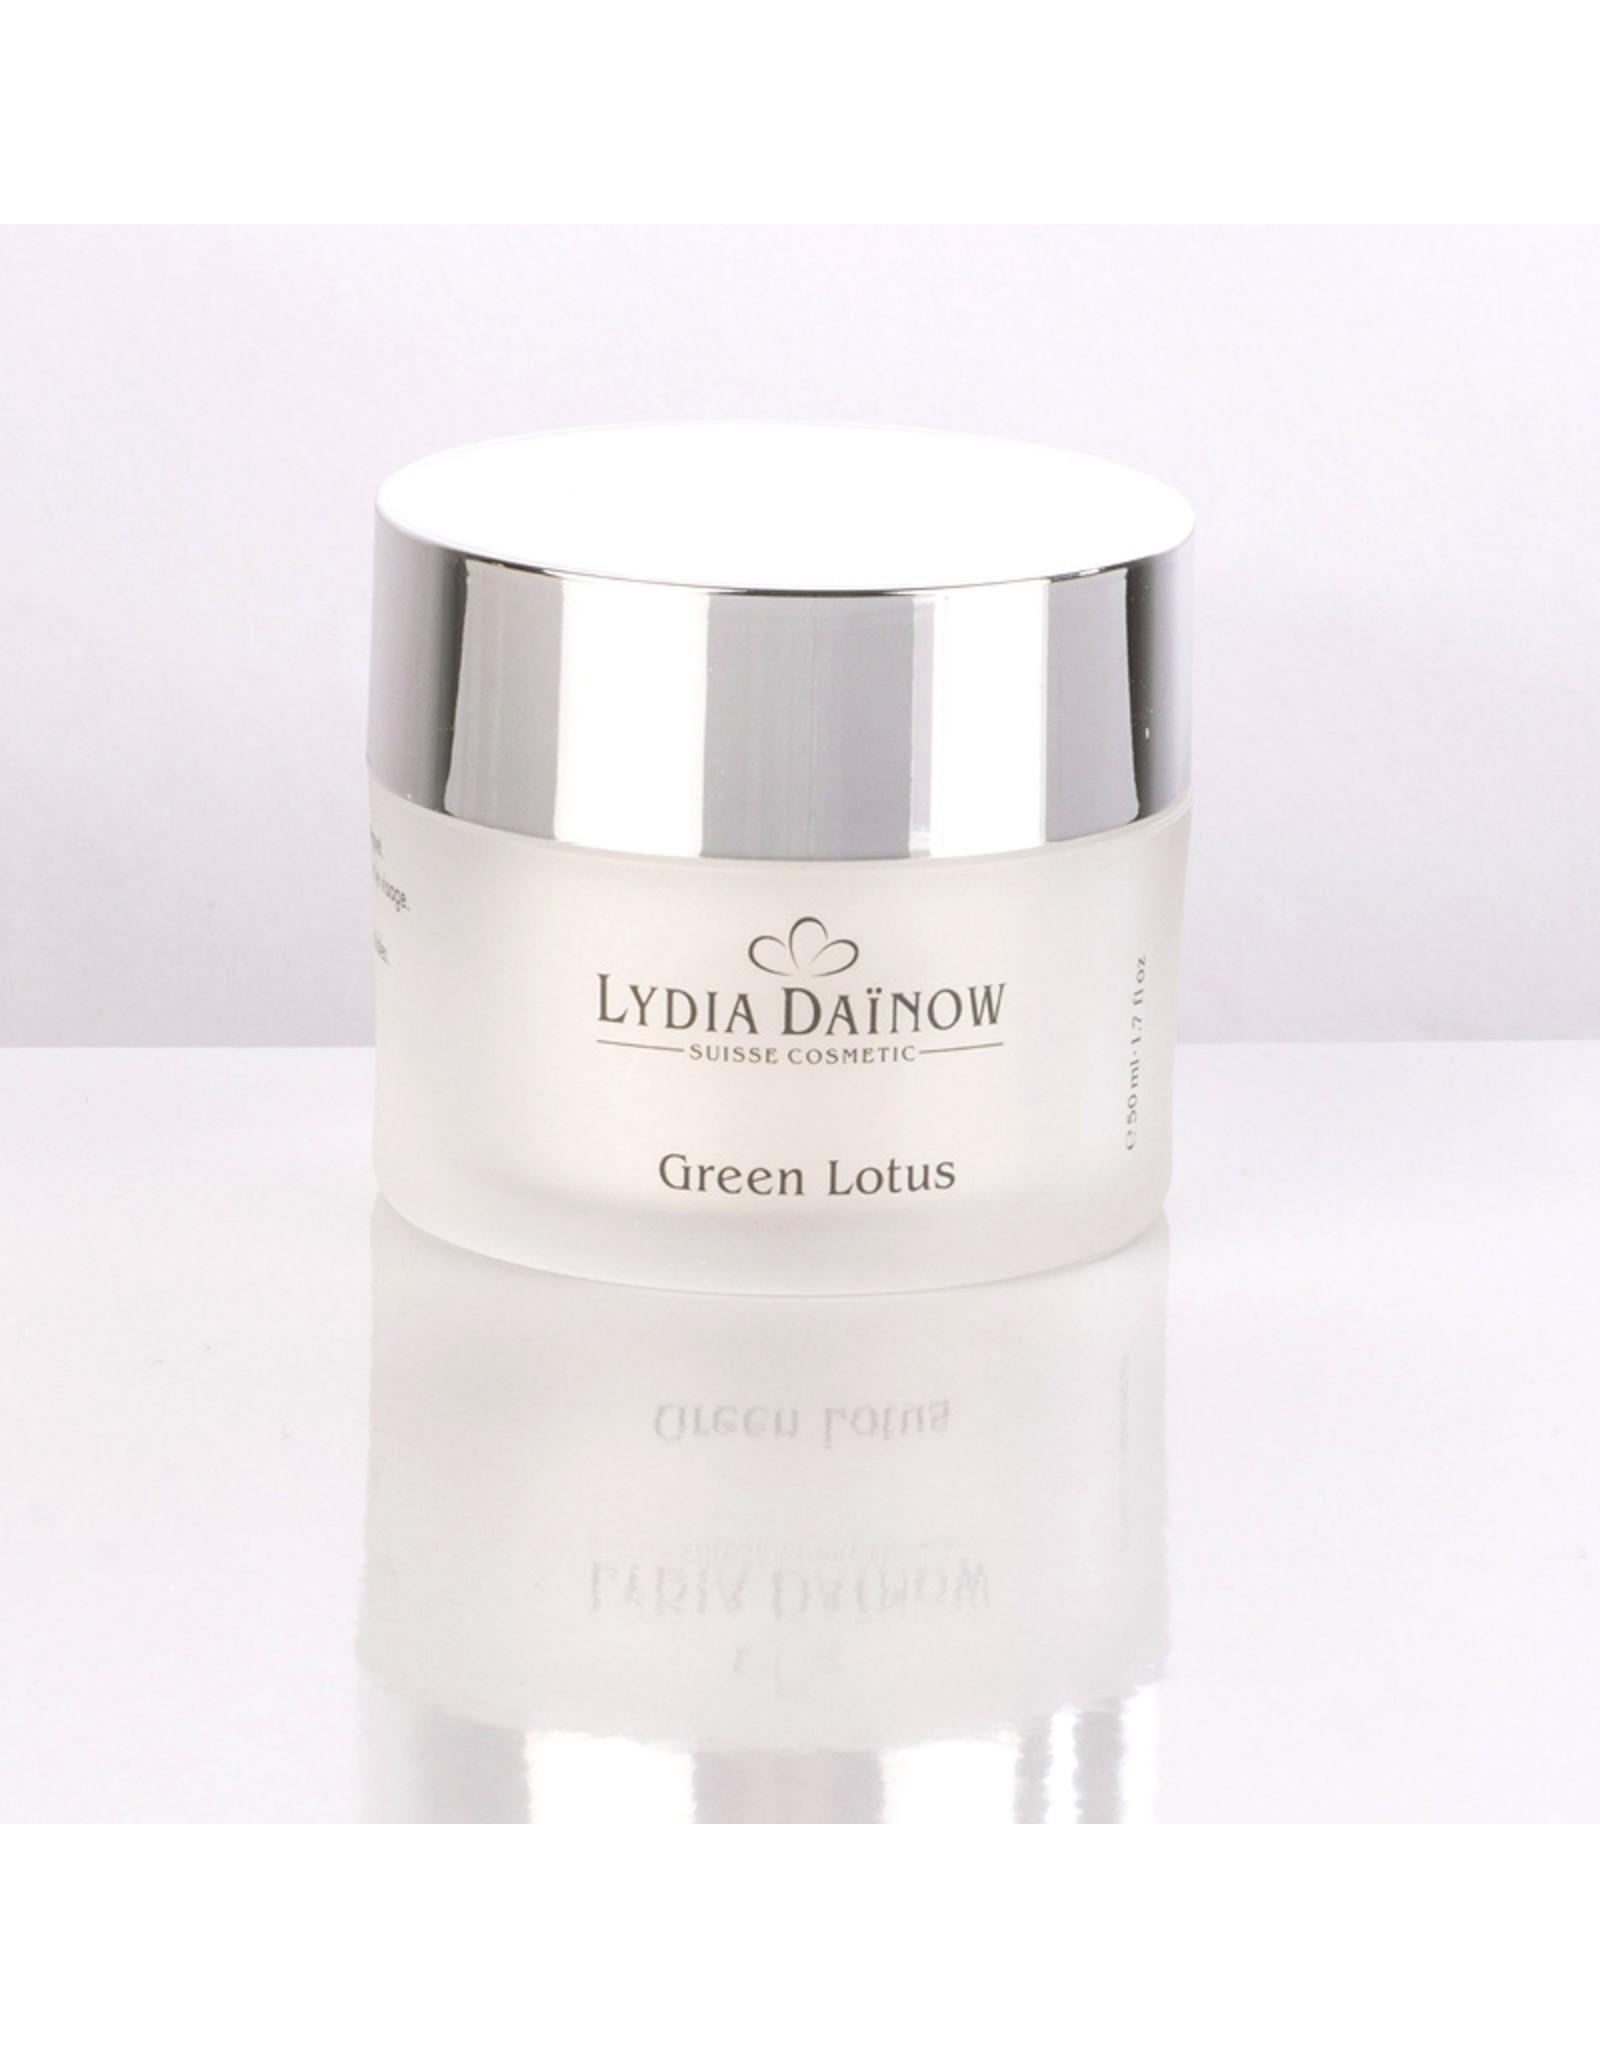 Lydïa Dainow Green Lotus - Crème protectrice